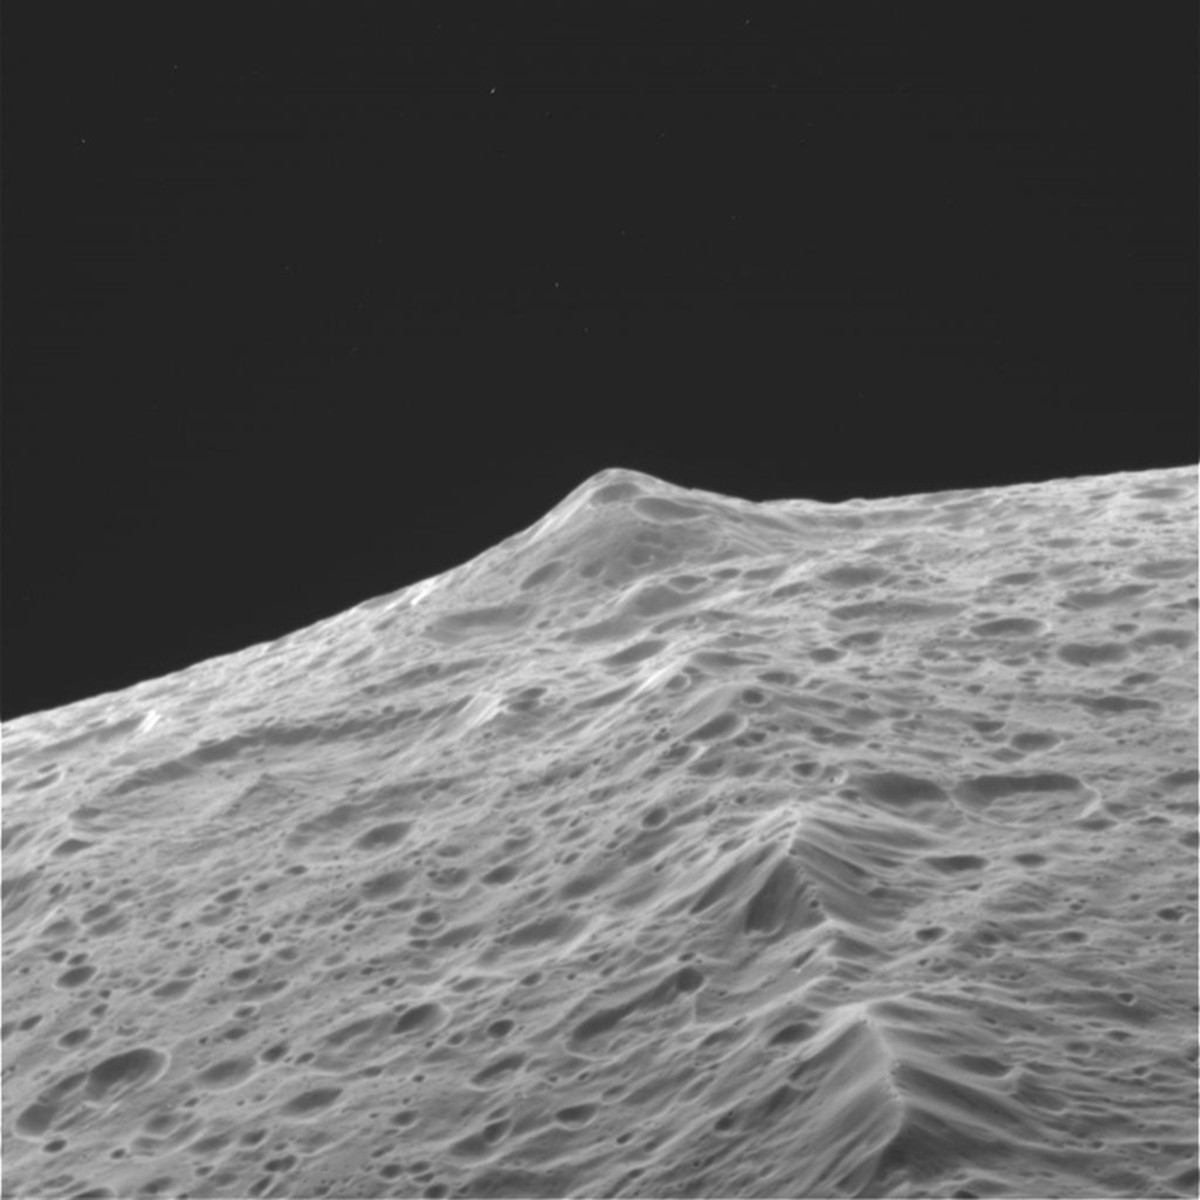 A close-up of the ridge.